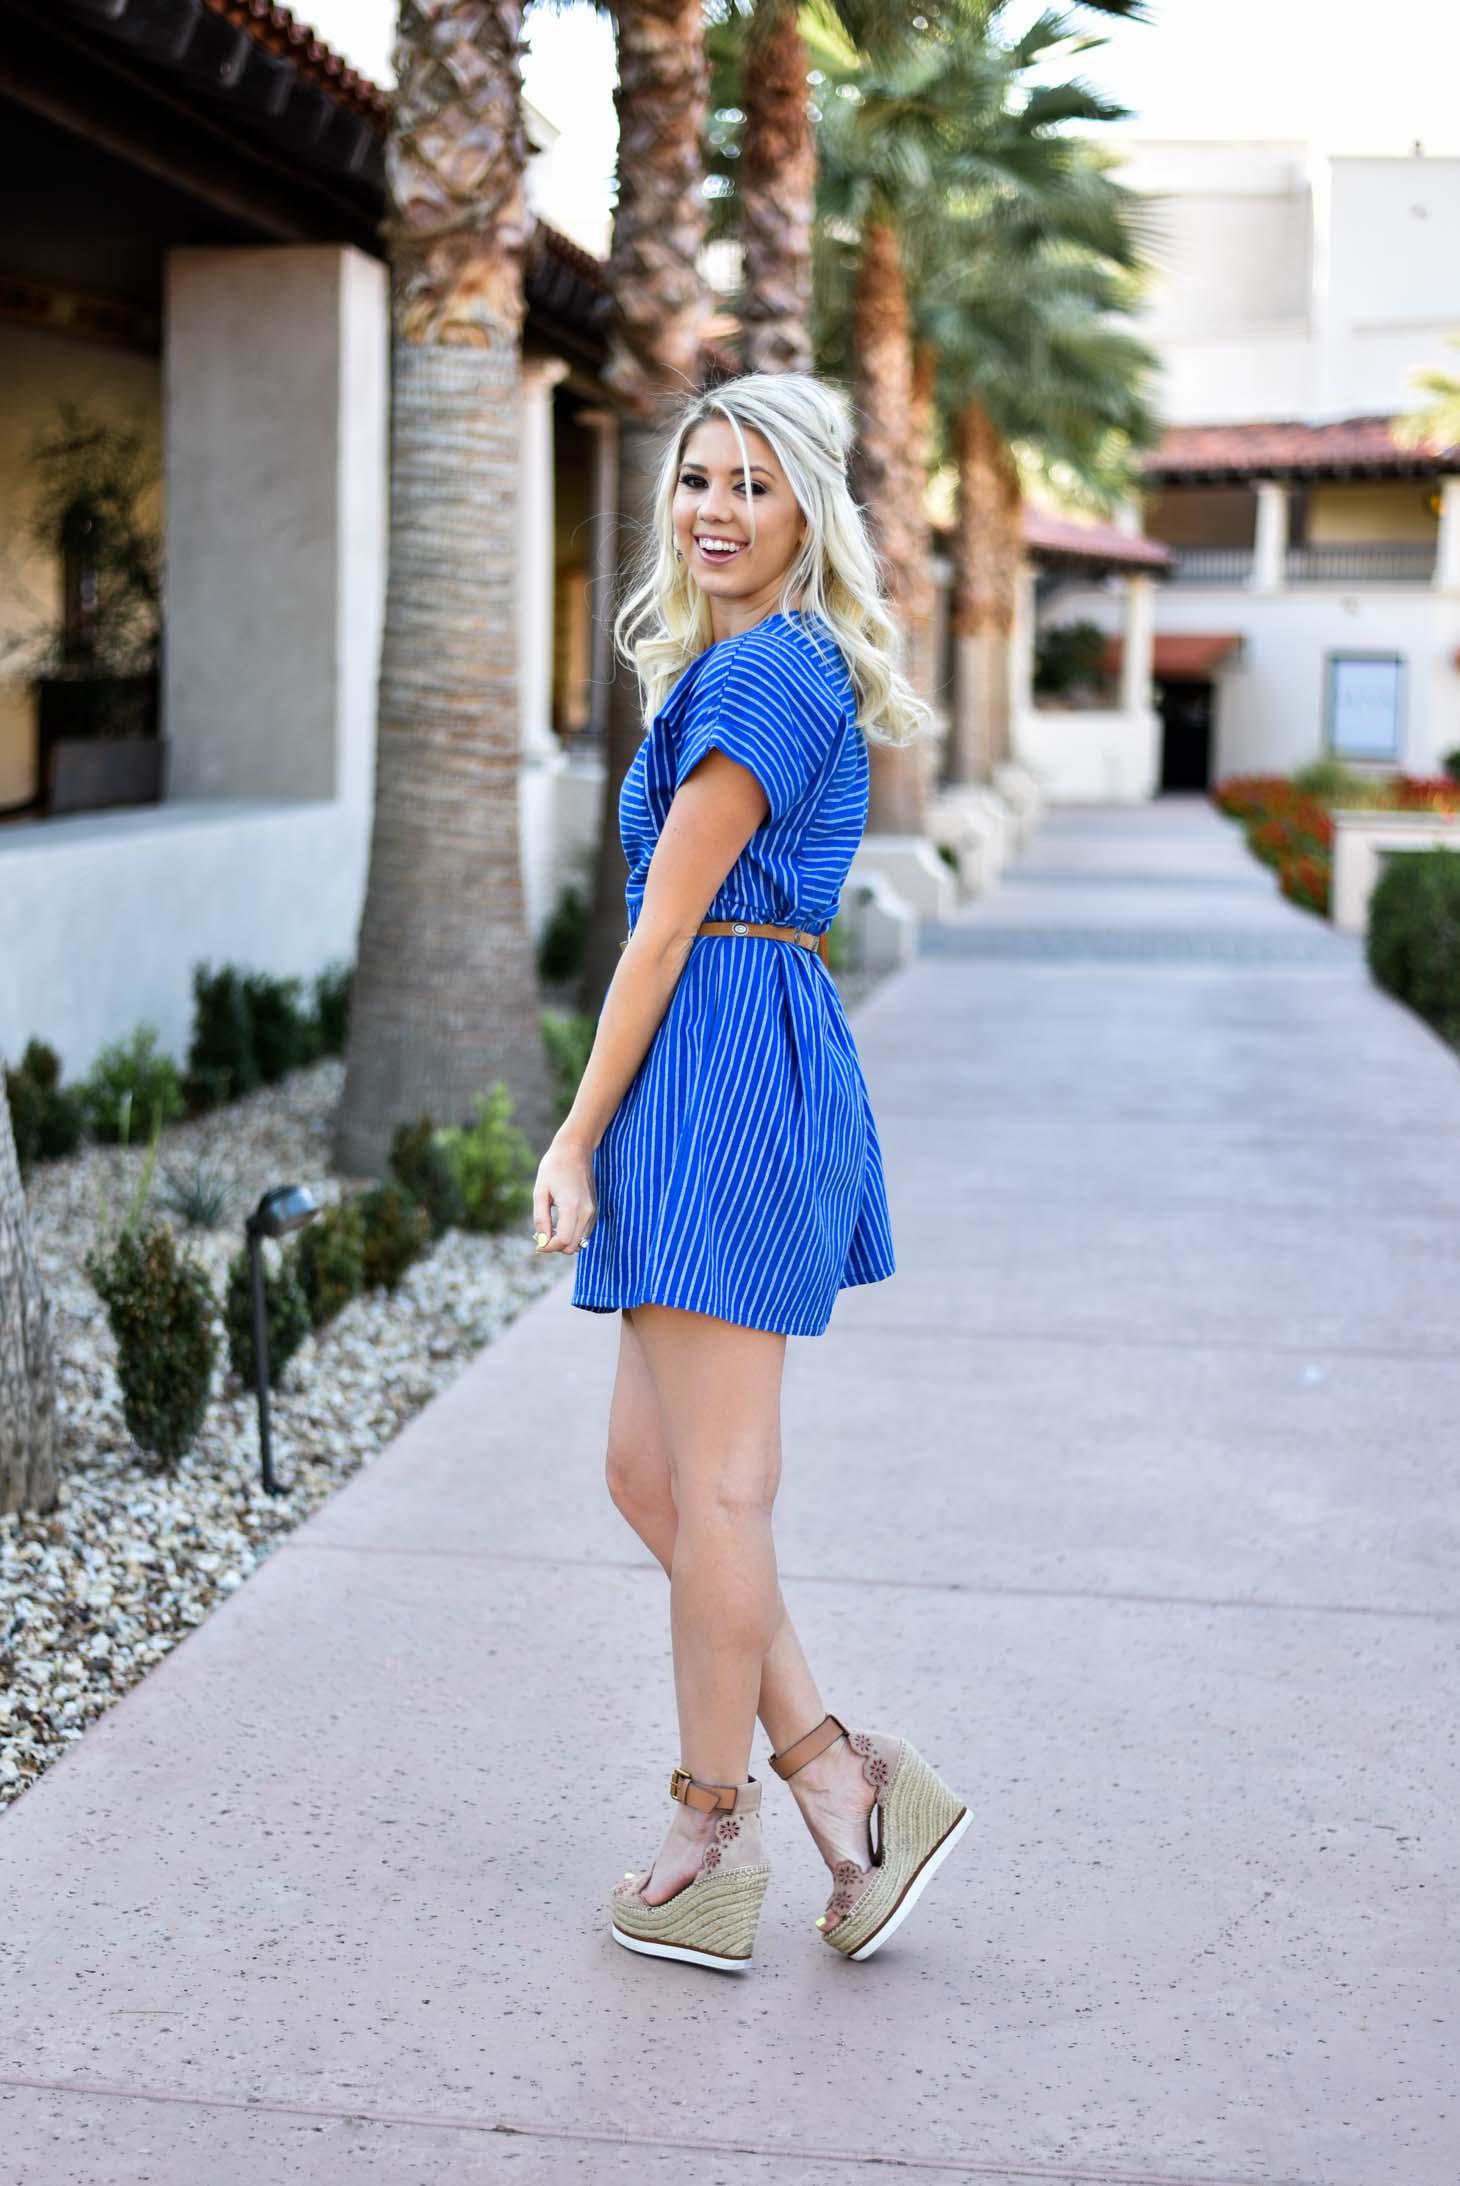 Erin Elizabeth of Wink and a Twirl in Spring Striped Blue Dress